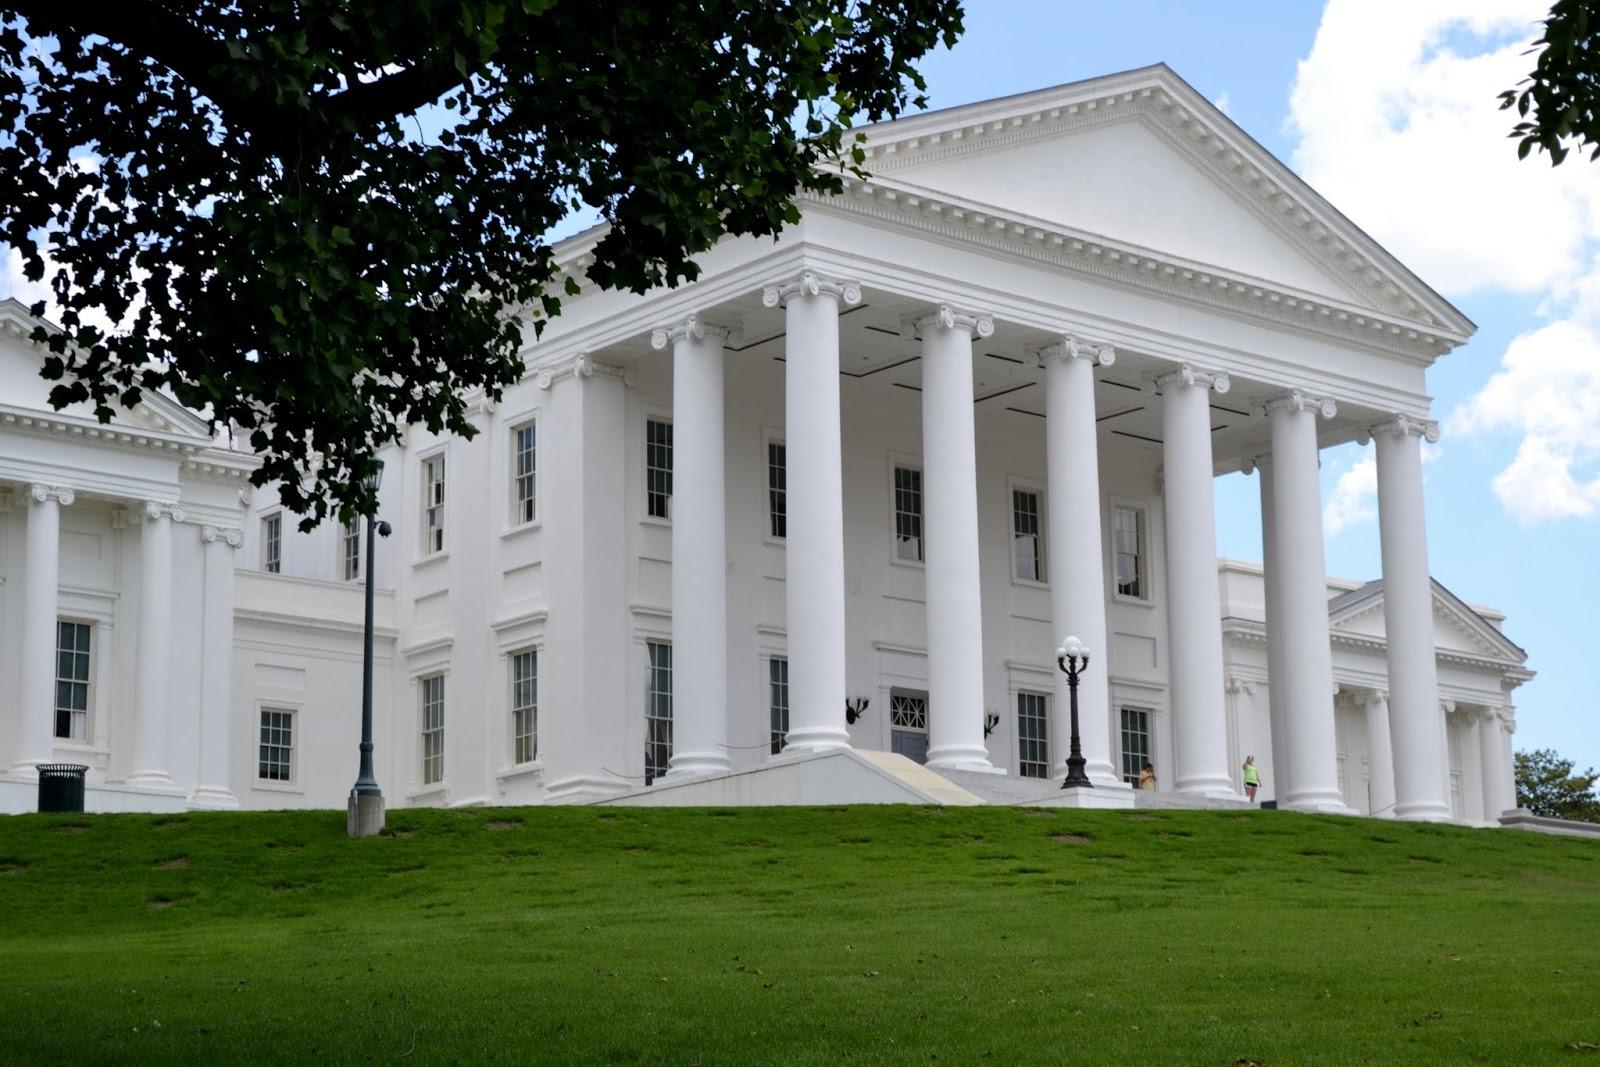 Капитолий. Ричмонд, Вирджиния (Virginia State Capitol. Richmond, VA)